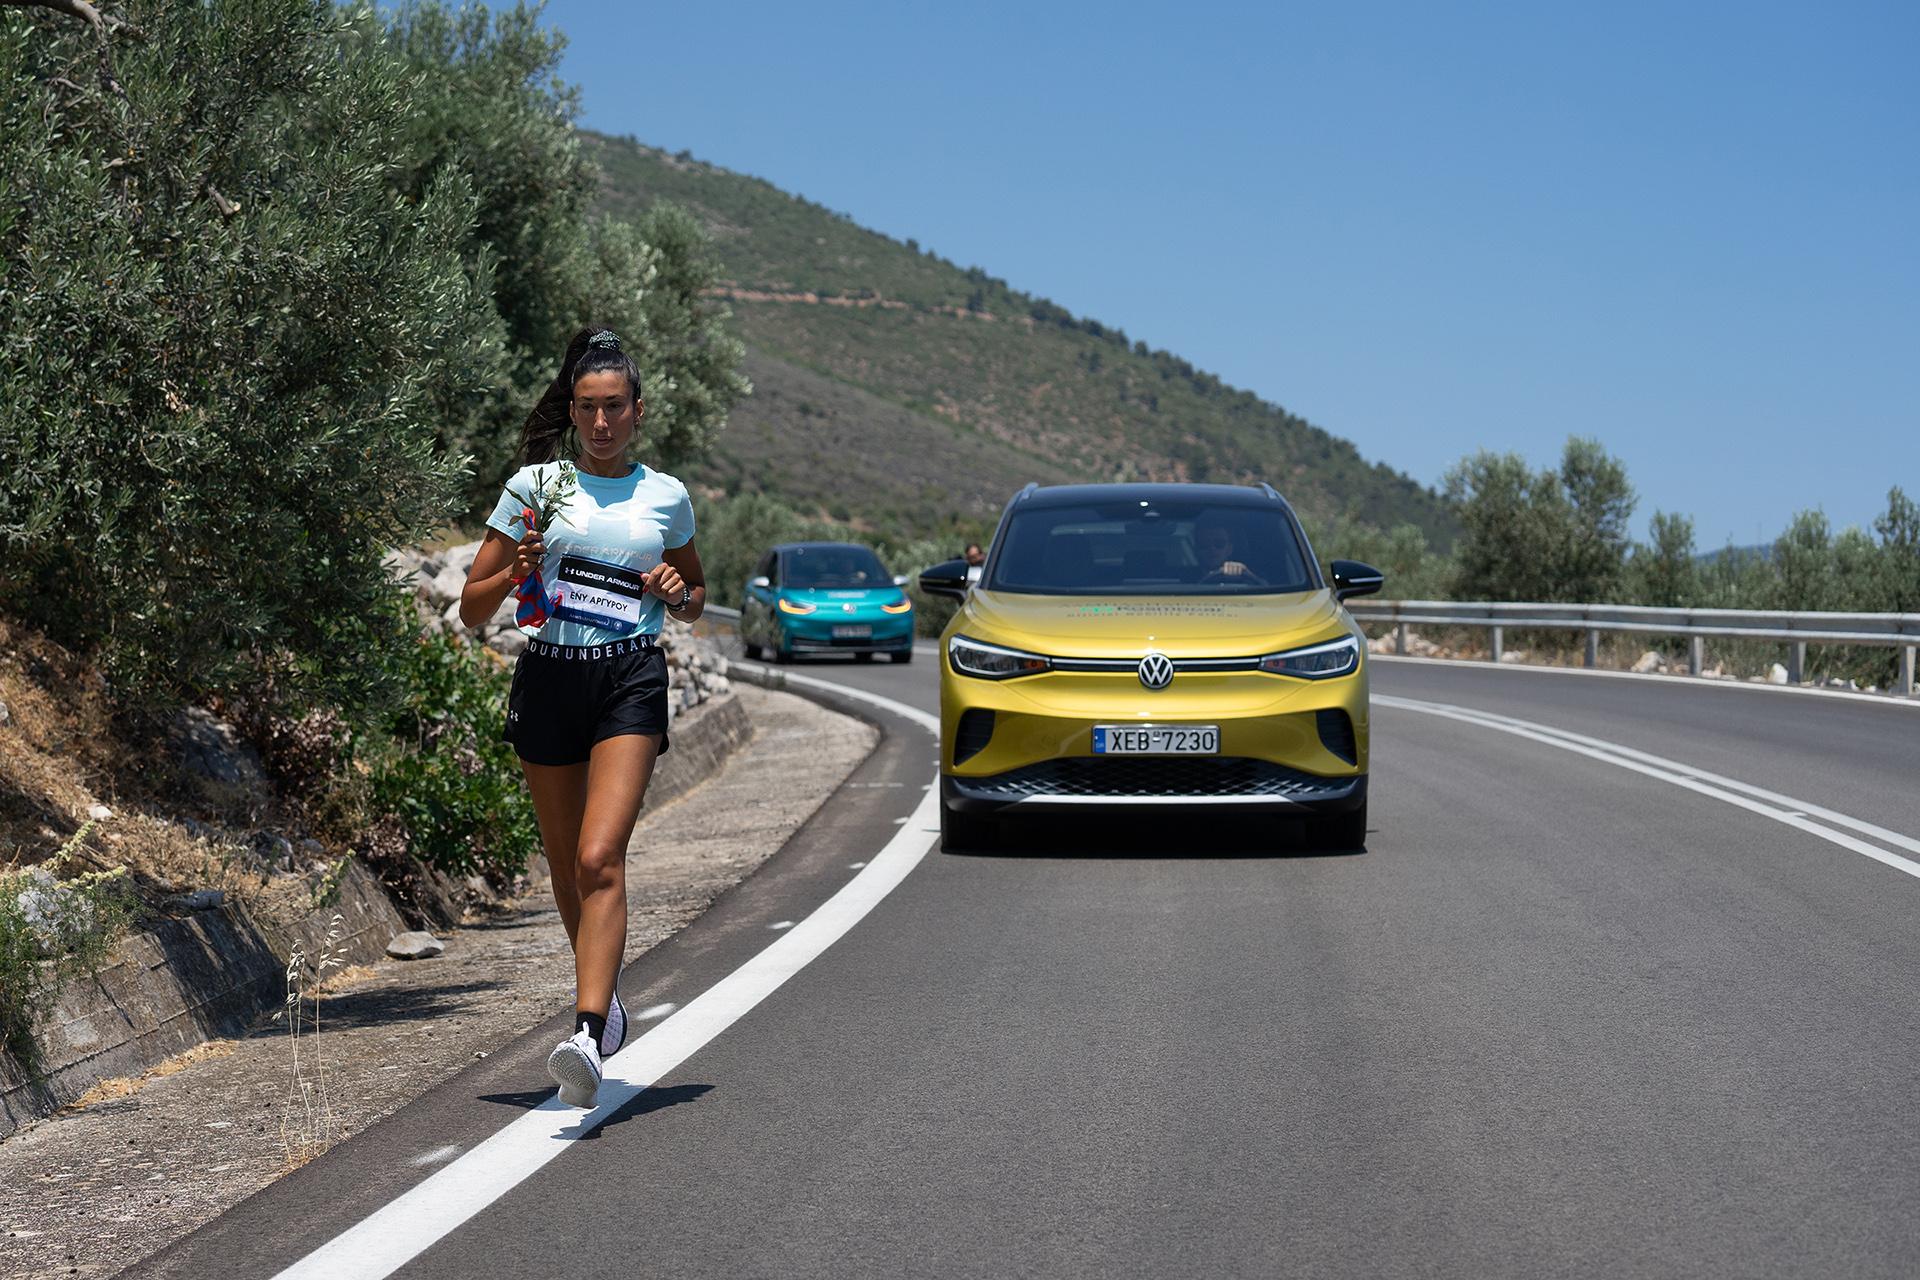 KOSMOCAR ΕΠΕΤΕΙΑΚΗ ΣΚΥΤΑΛΟΔΡΟΜΙΑ SPETSES MINI MARATHON 6 Η Kosmocar στο Spetses Mini Marathon